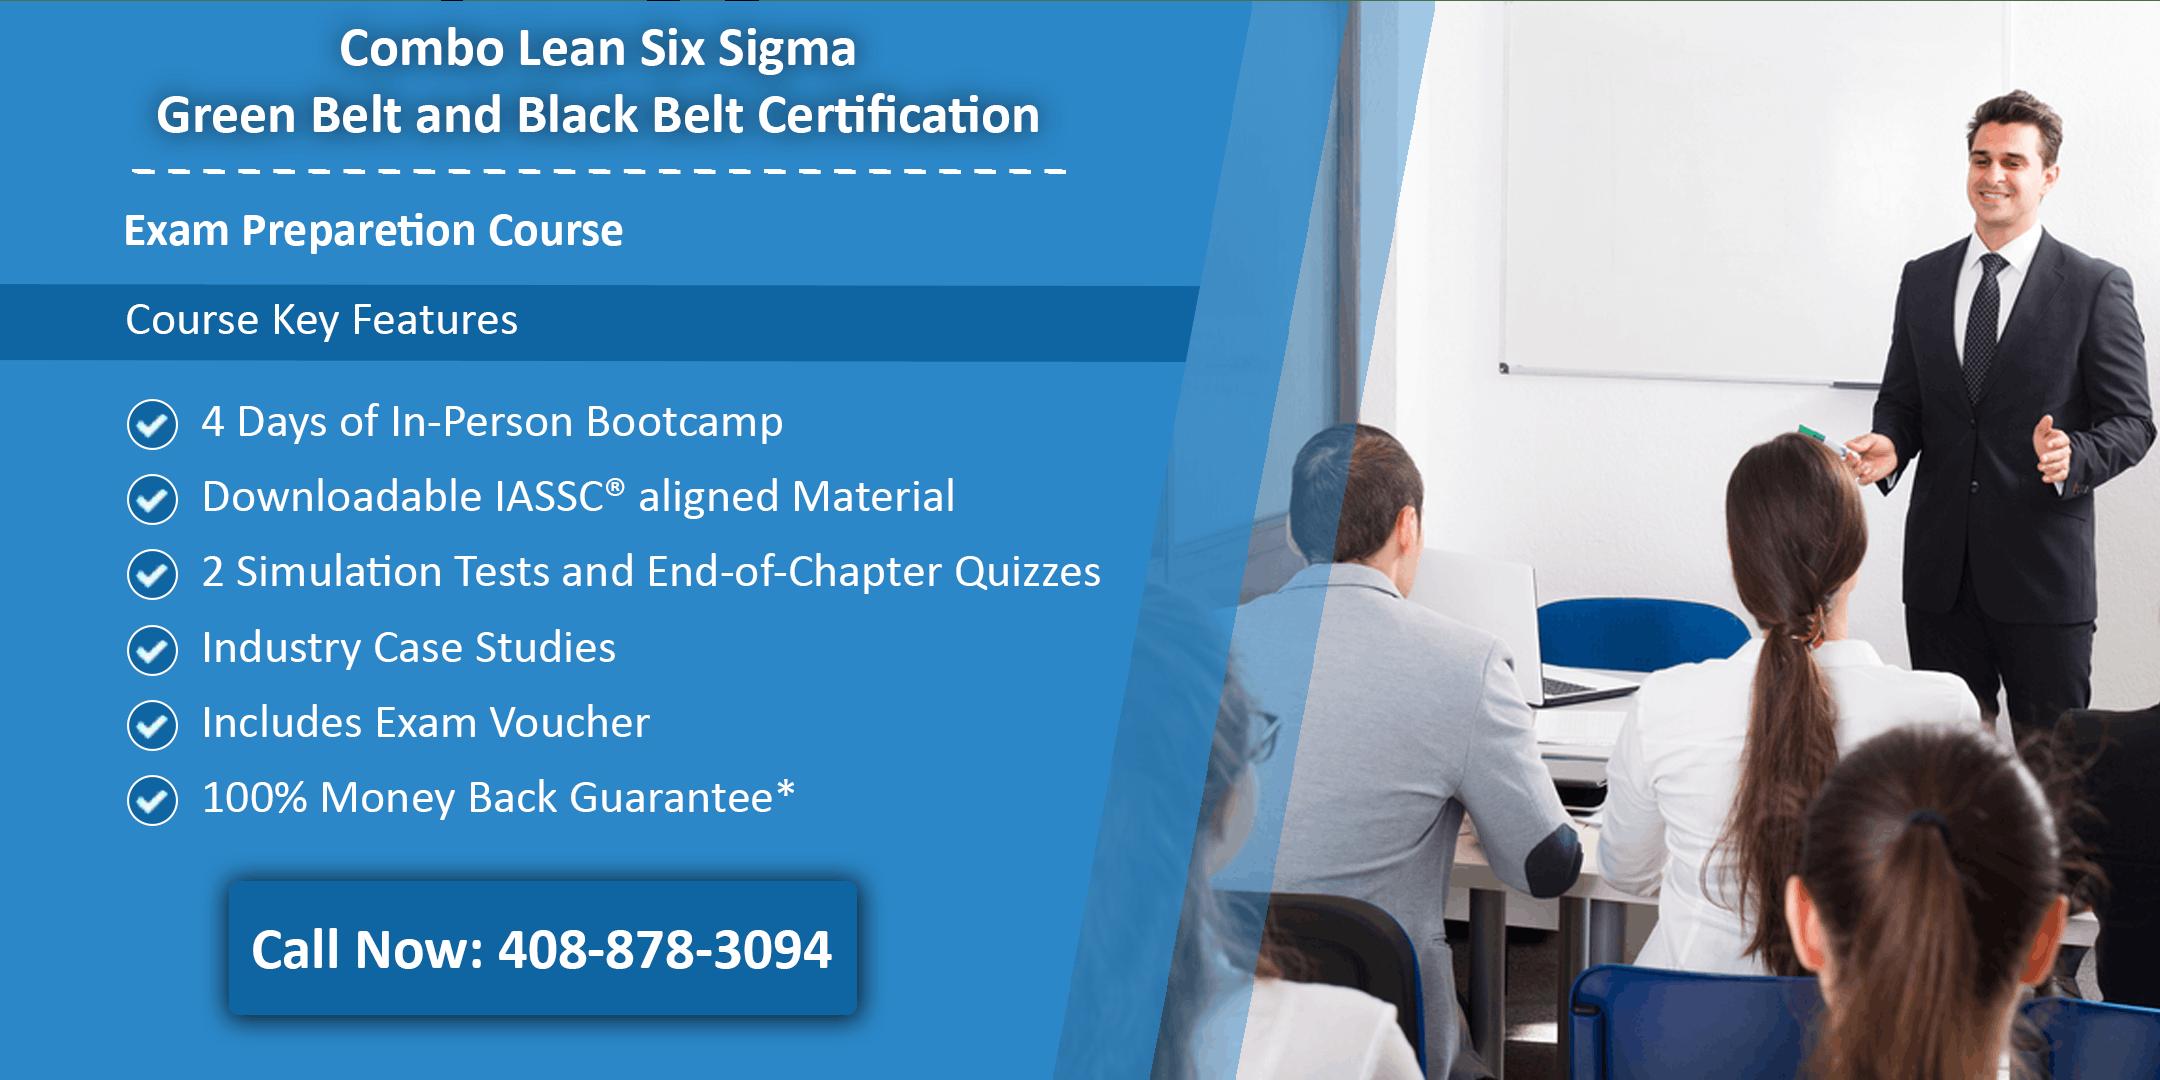 Combo Lean Six Sigma Green Belt and Black Belt Certification Training In Denver, CO